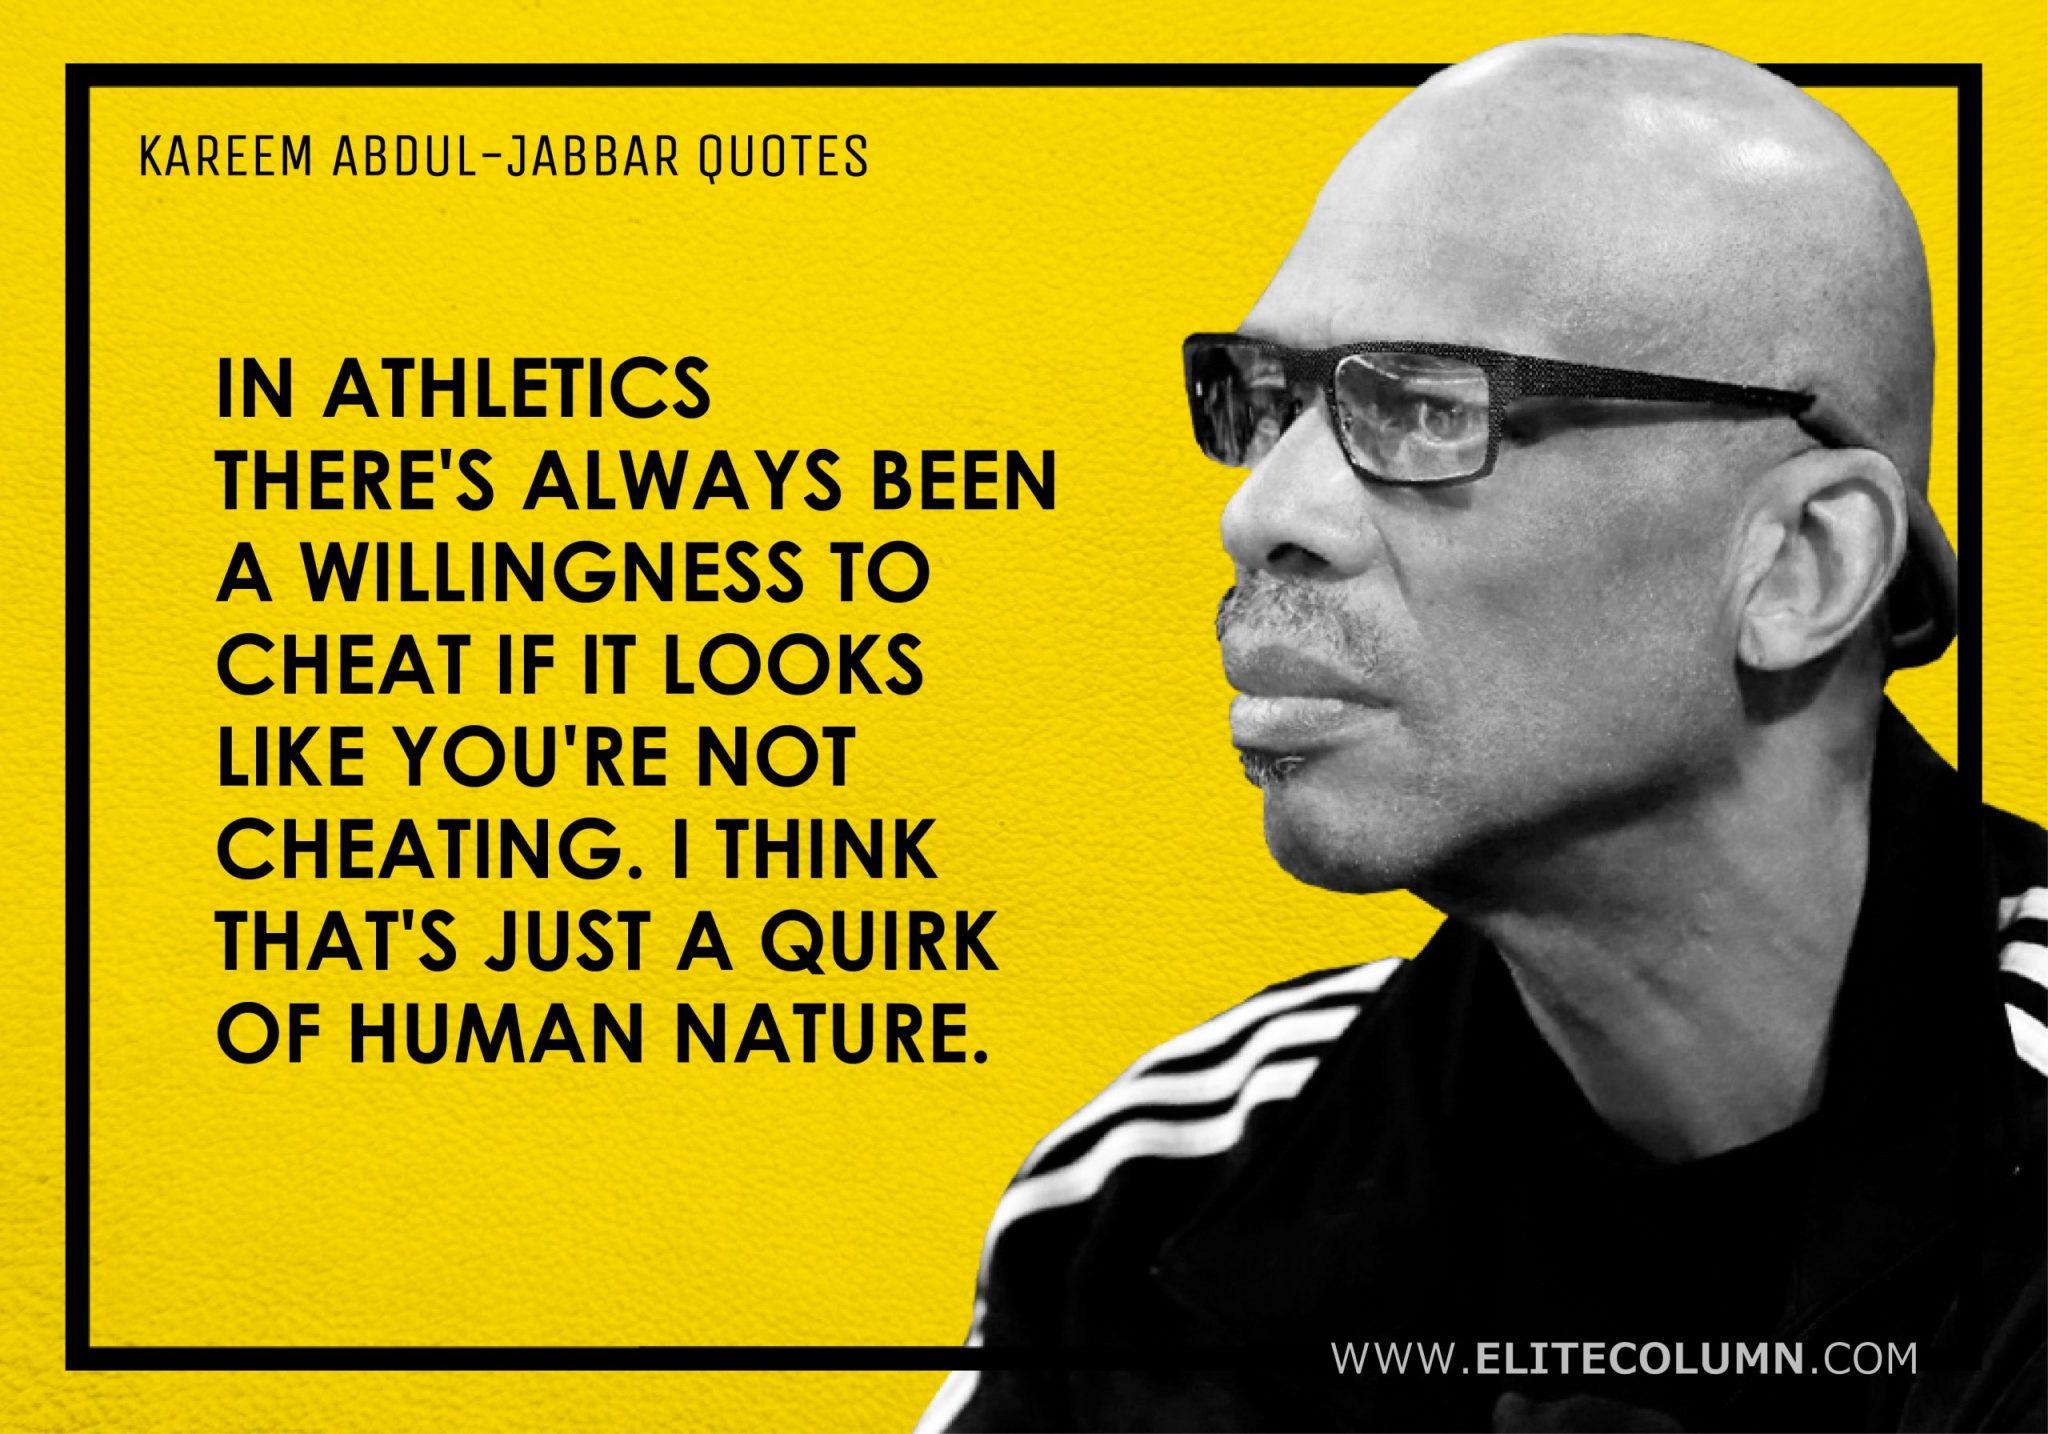 Kareem Abdul-Jabbar Quotes (6)